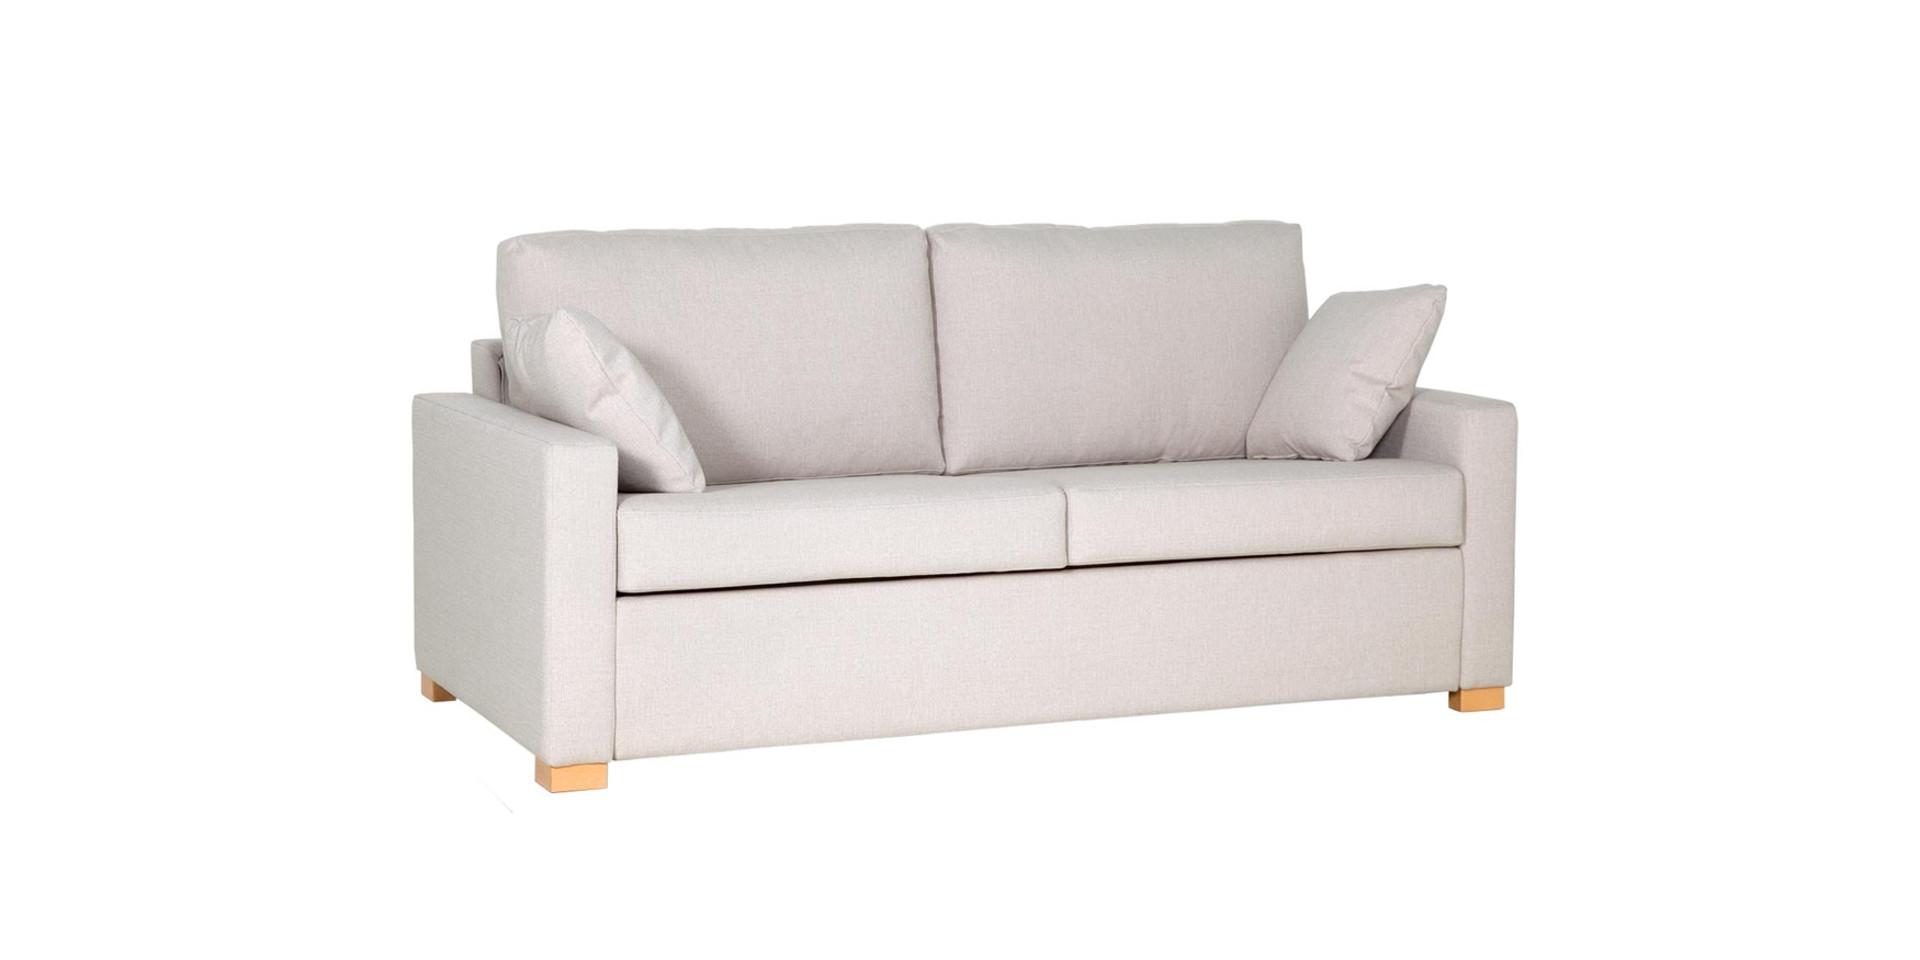 sits-tucson-canape-convertible-sofa_bed3_veraam374_beige_2